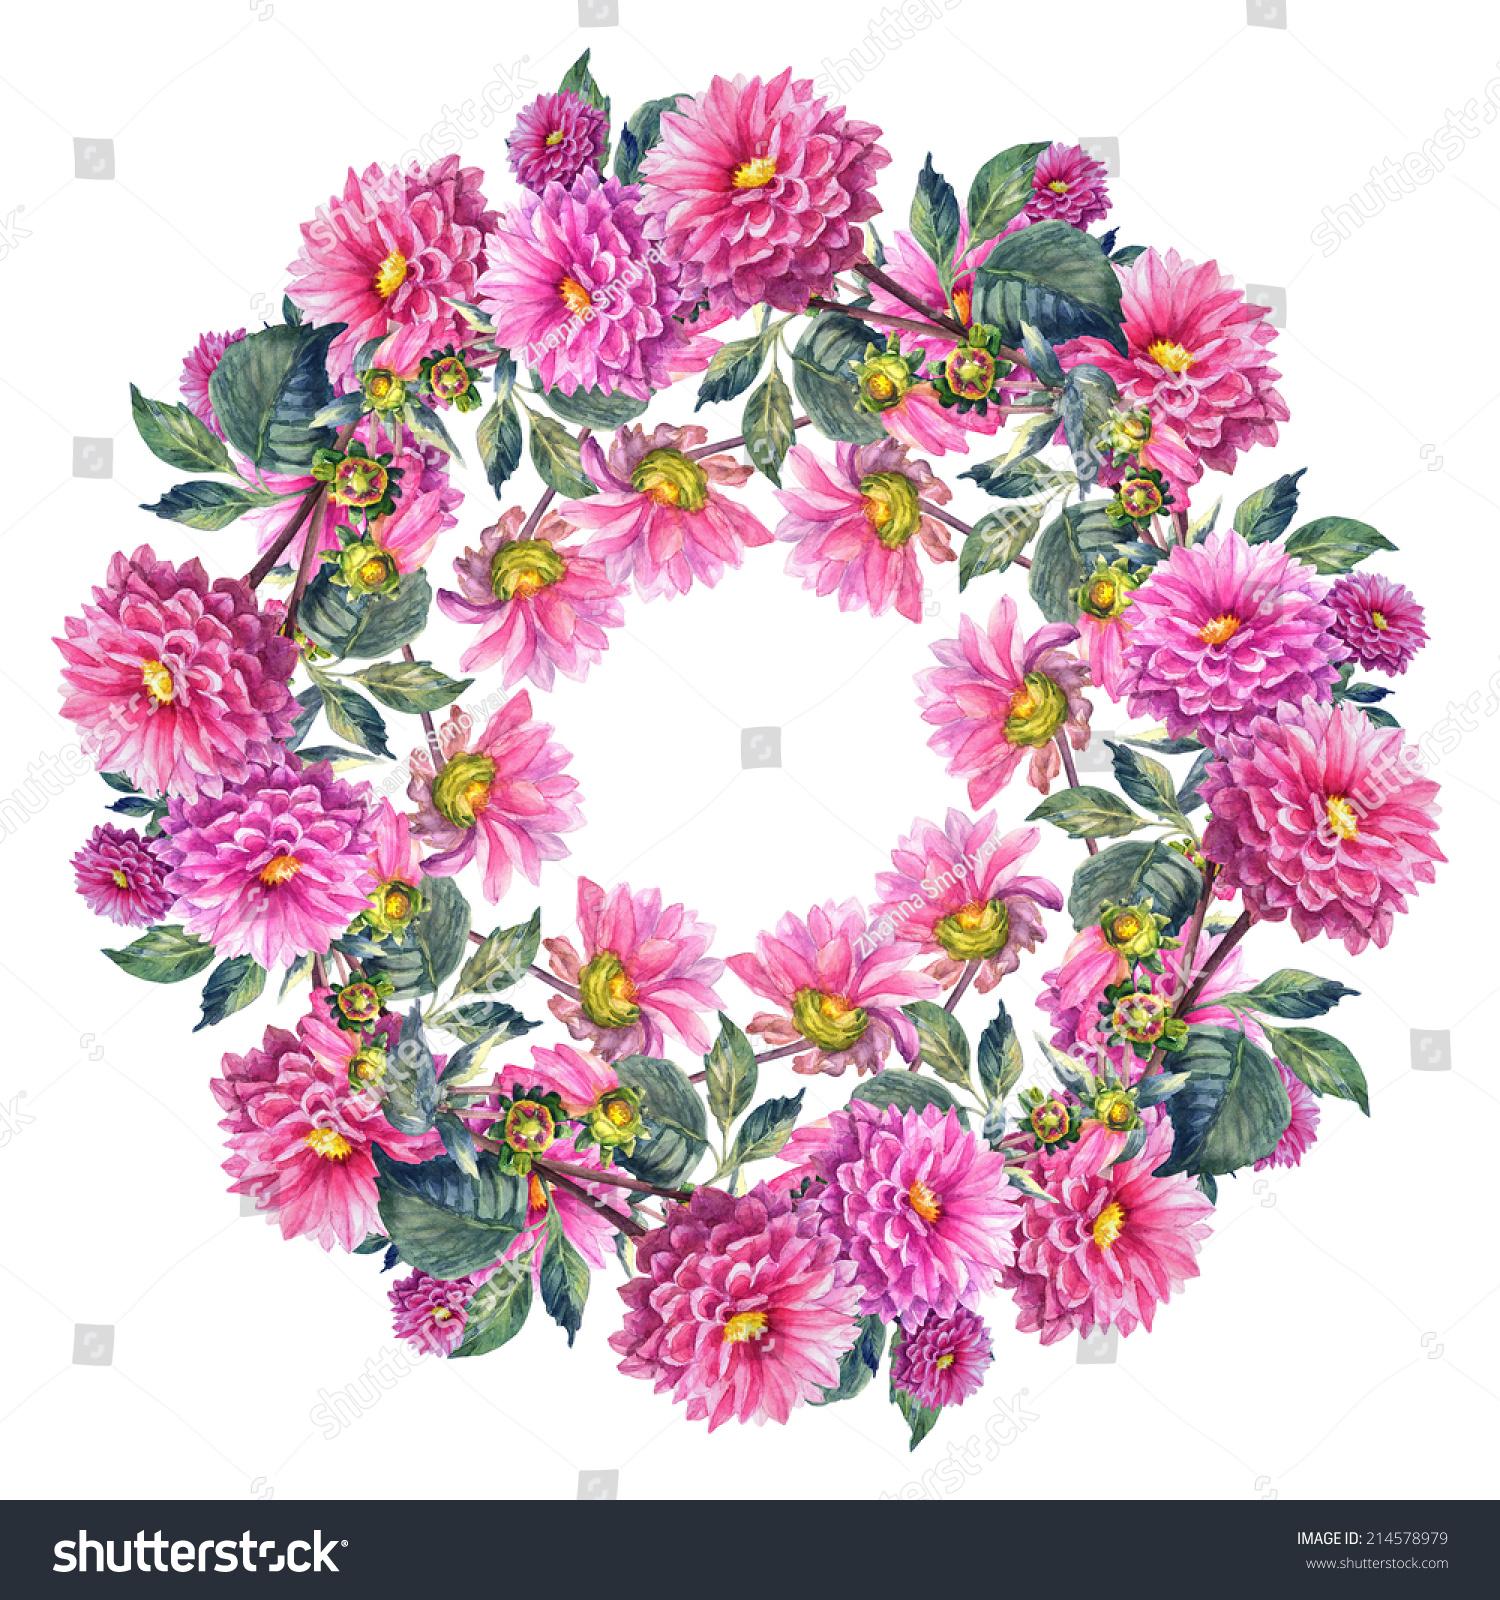 Beautiful pink dahlias flowers garland template stock illustration beautiful pink dahlias flowers garland template watercolor hand painted illustration izmirmasajfo